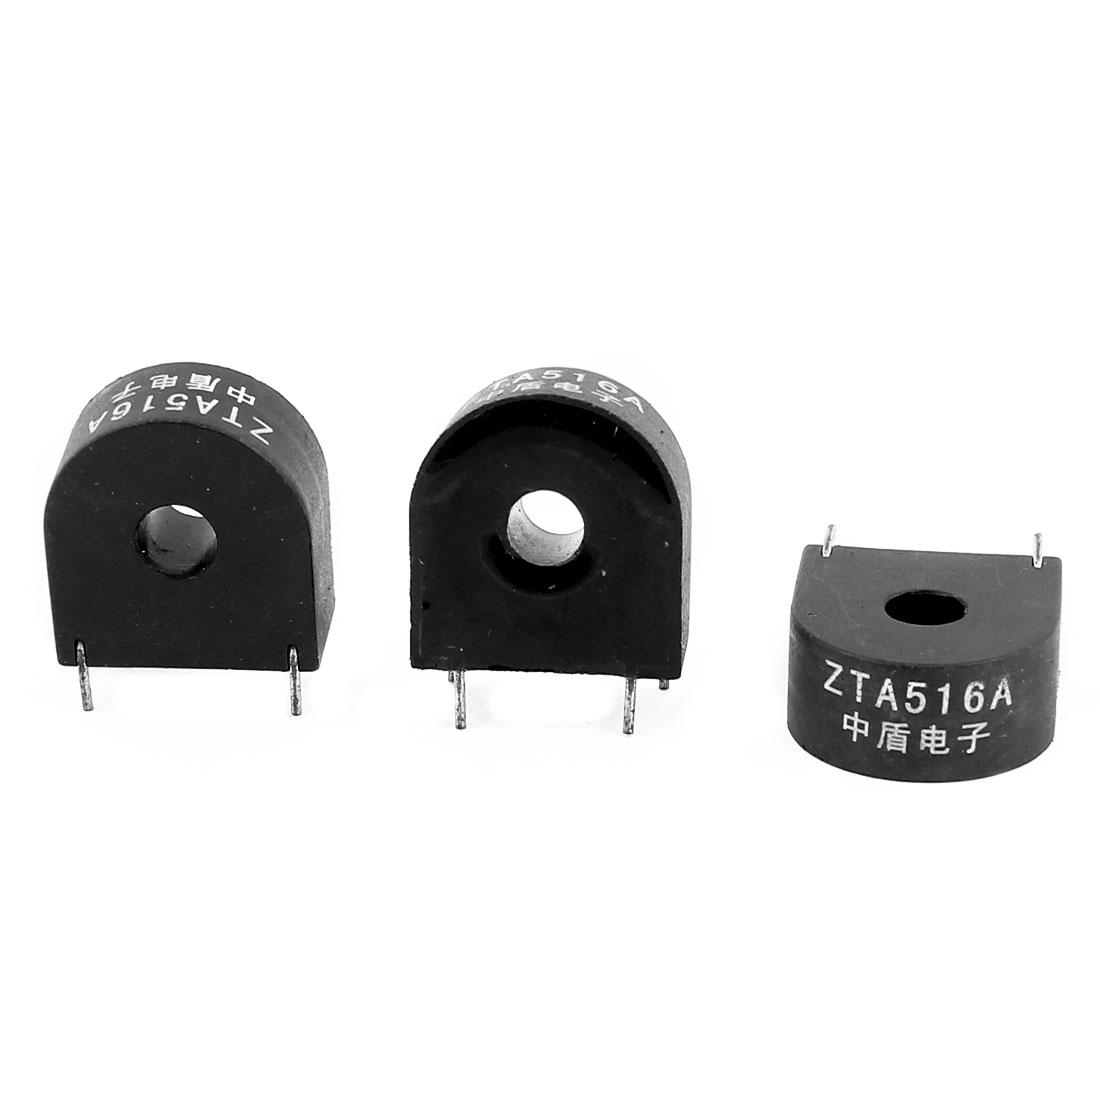 ZTA516A 5A/2mA 4 Terminal Precision AC Micro Current Transformer Sensor 3Pcs